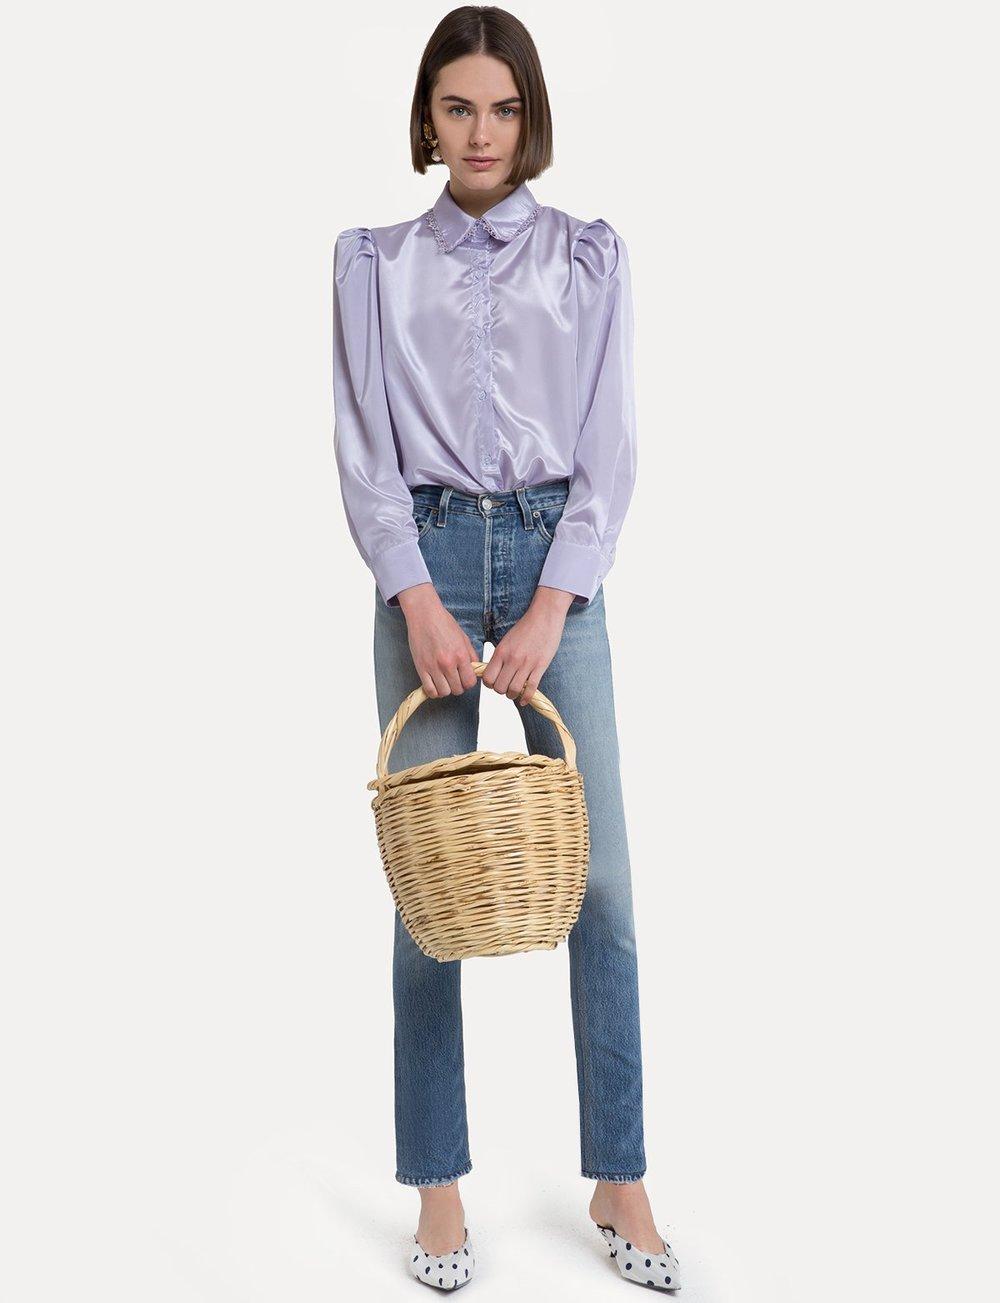 Vivian lavender satin blouse by Pixie Market